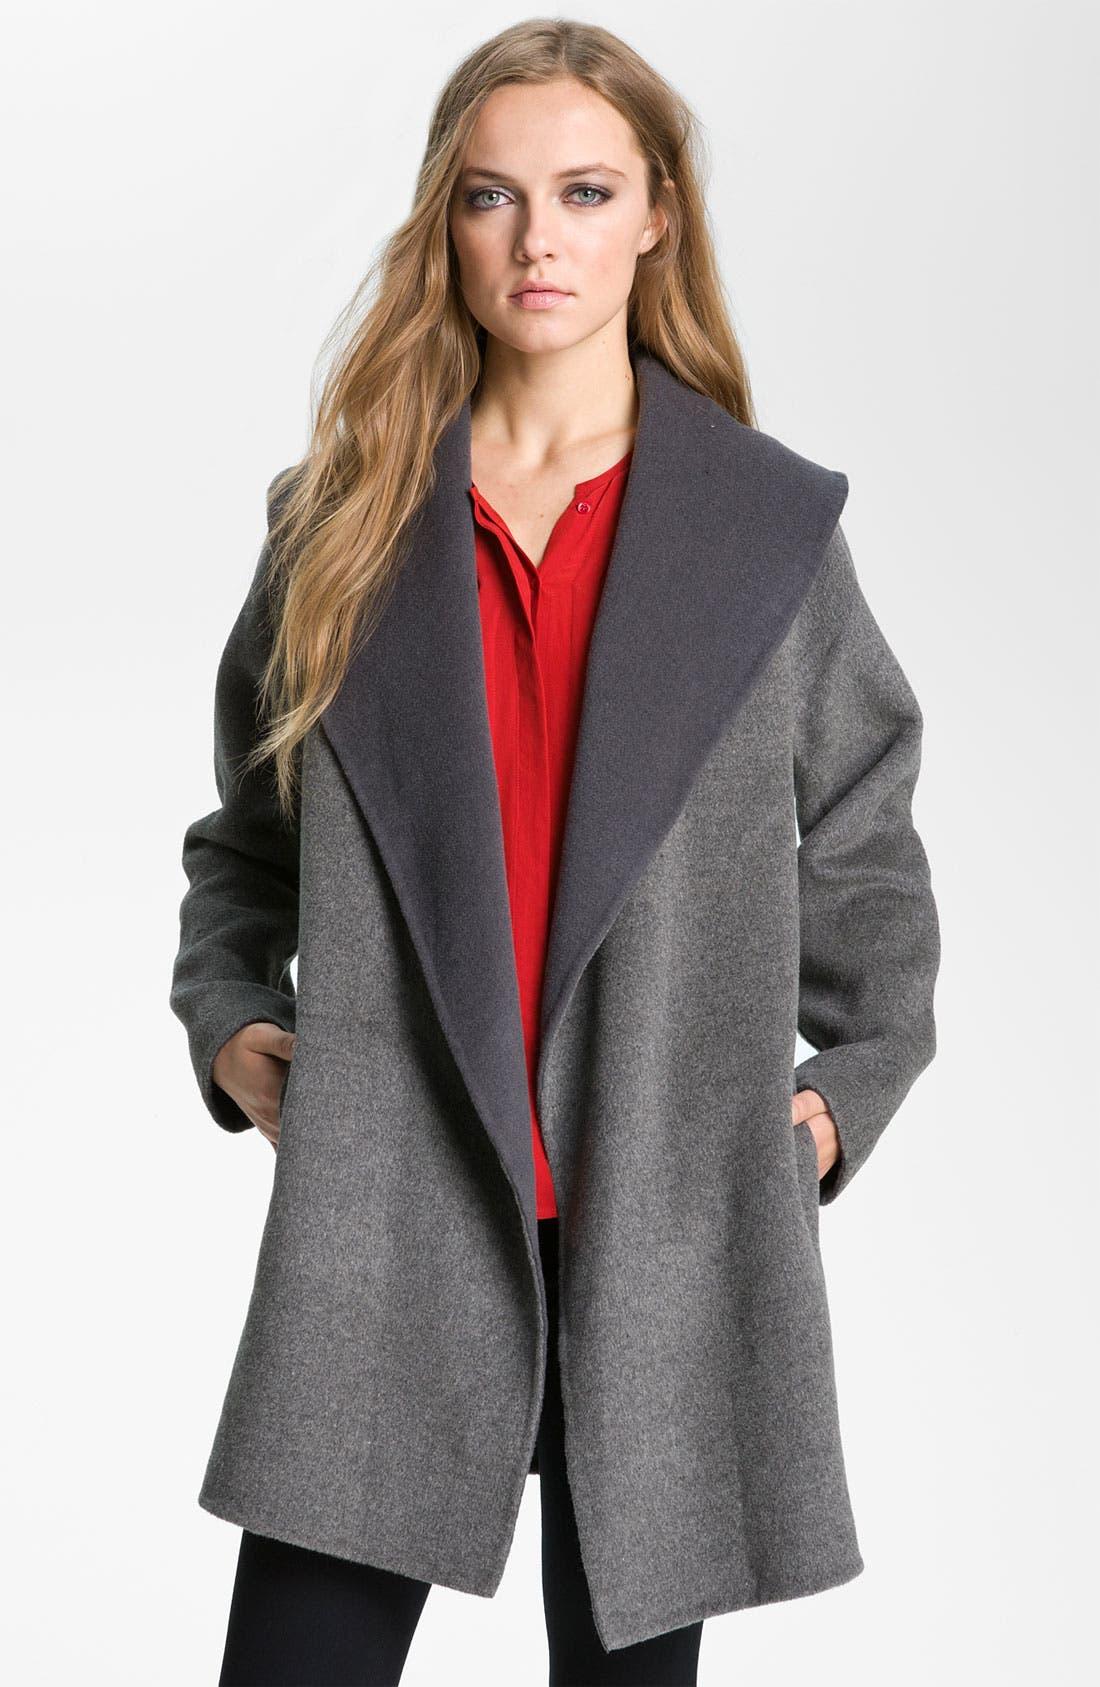 Main Image - Joie 'Teyona' Two Tone Wool Blend Jacket